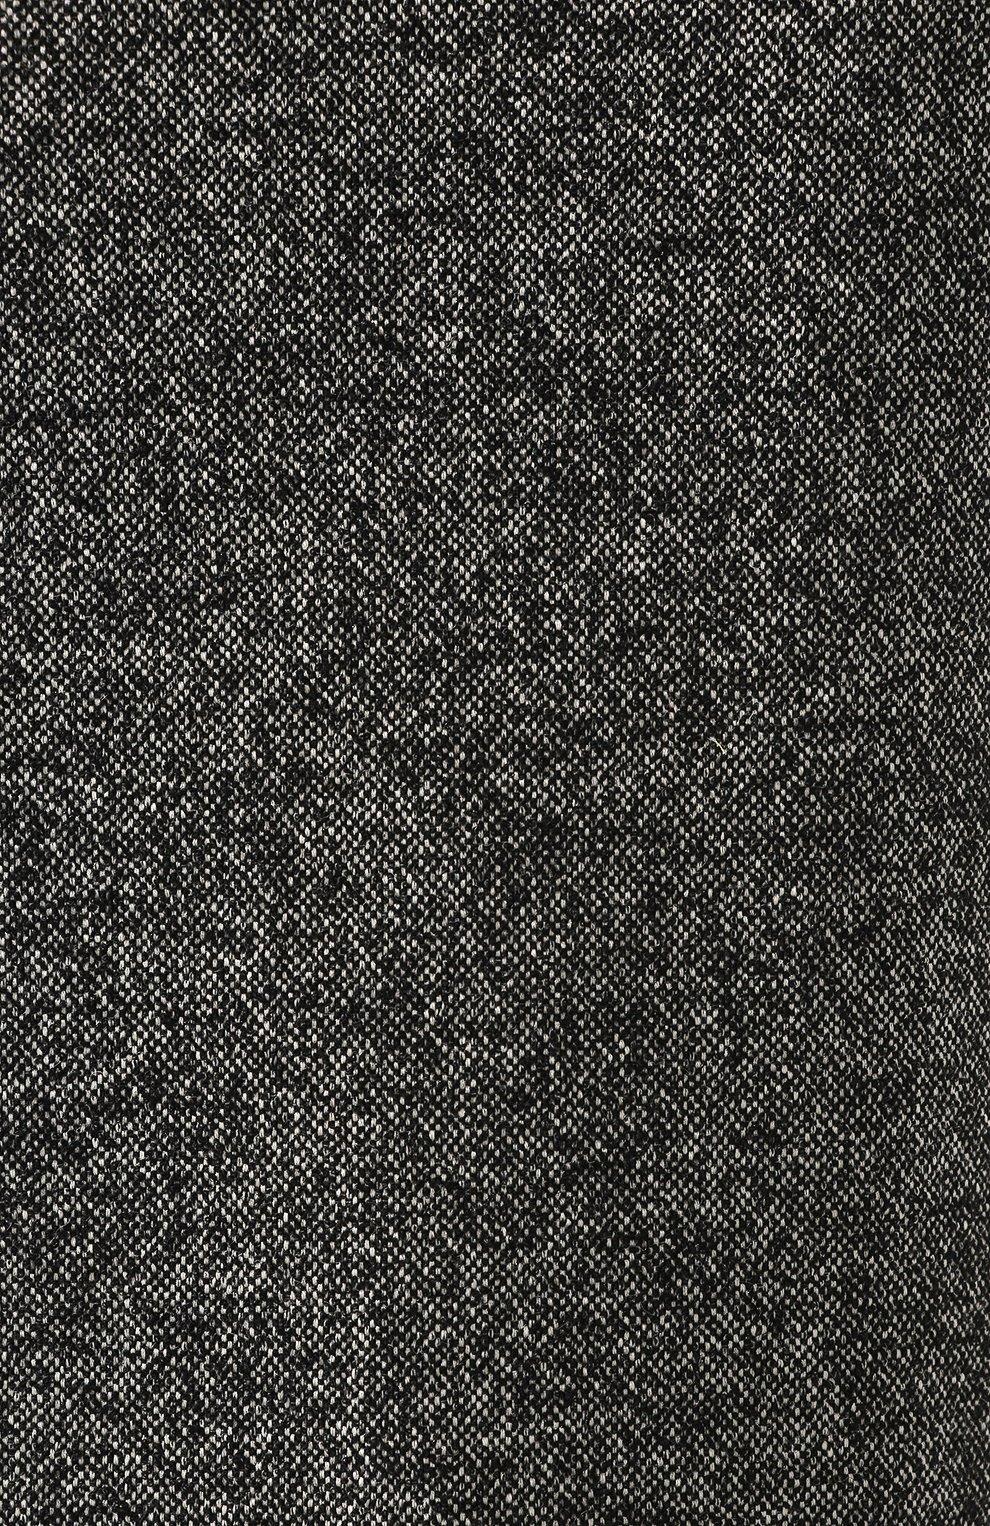 Юбка из вискозы | Фото №5